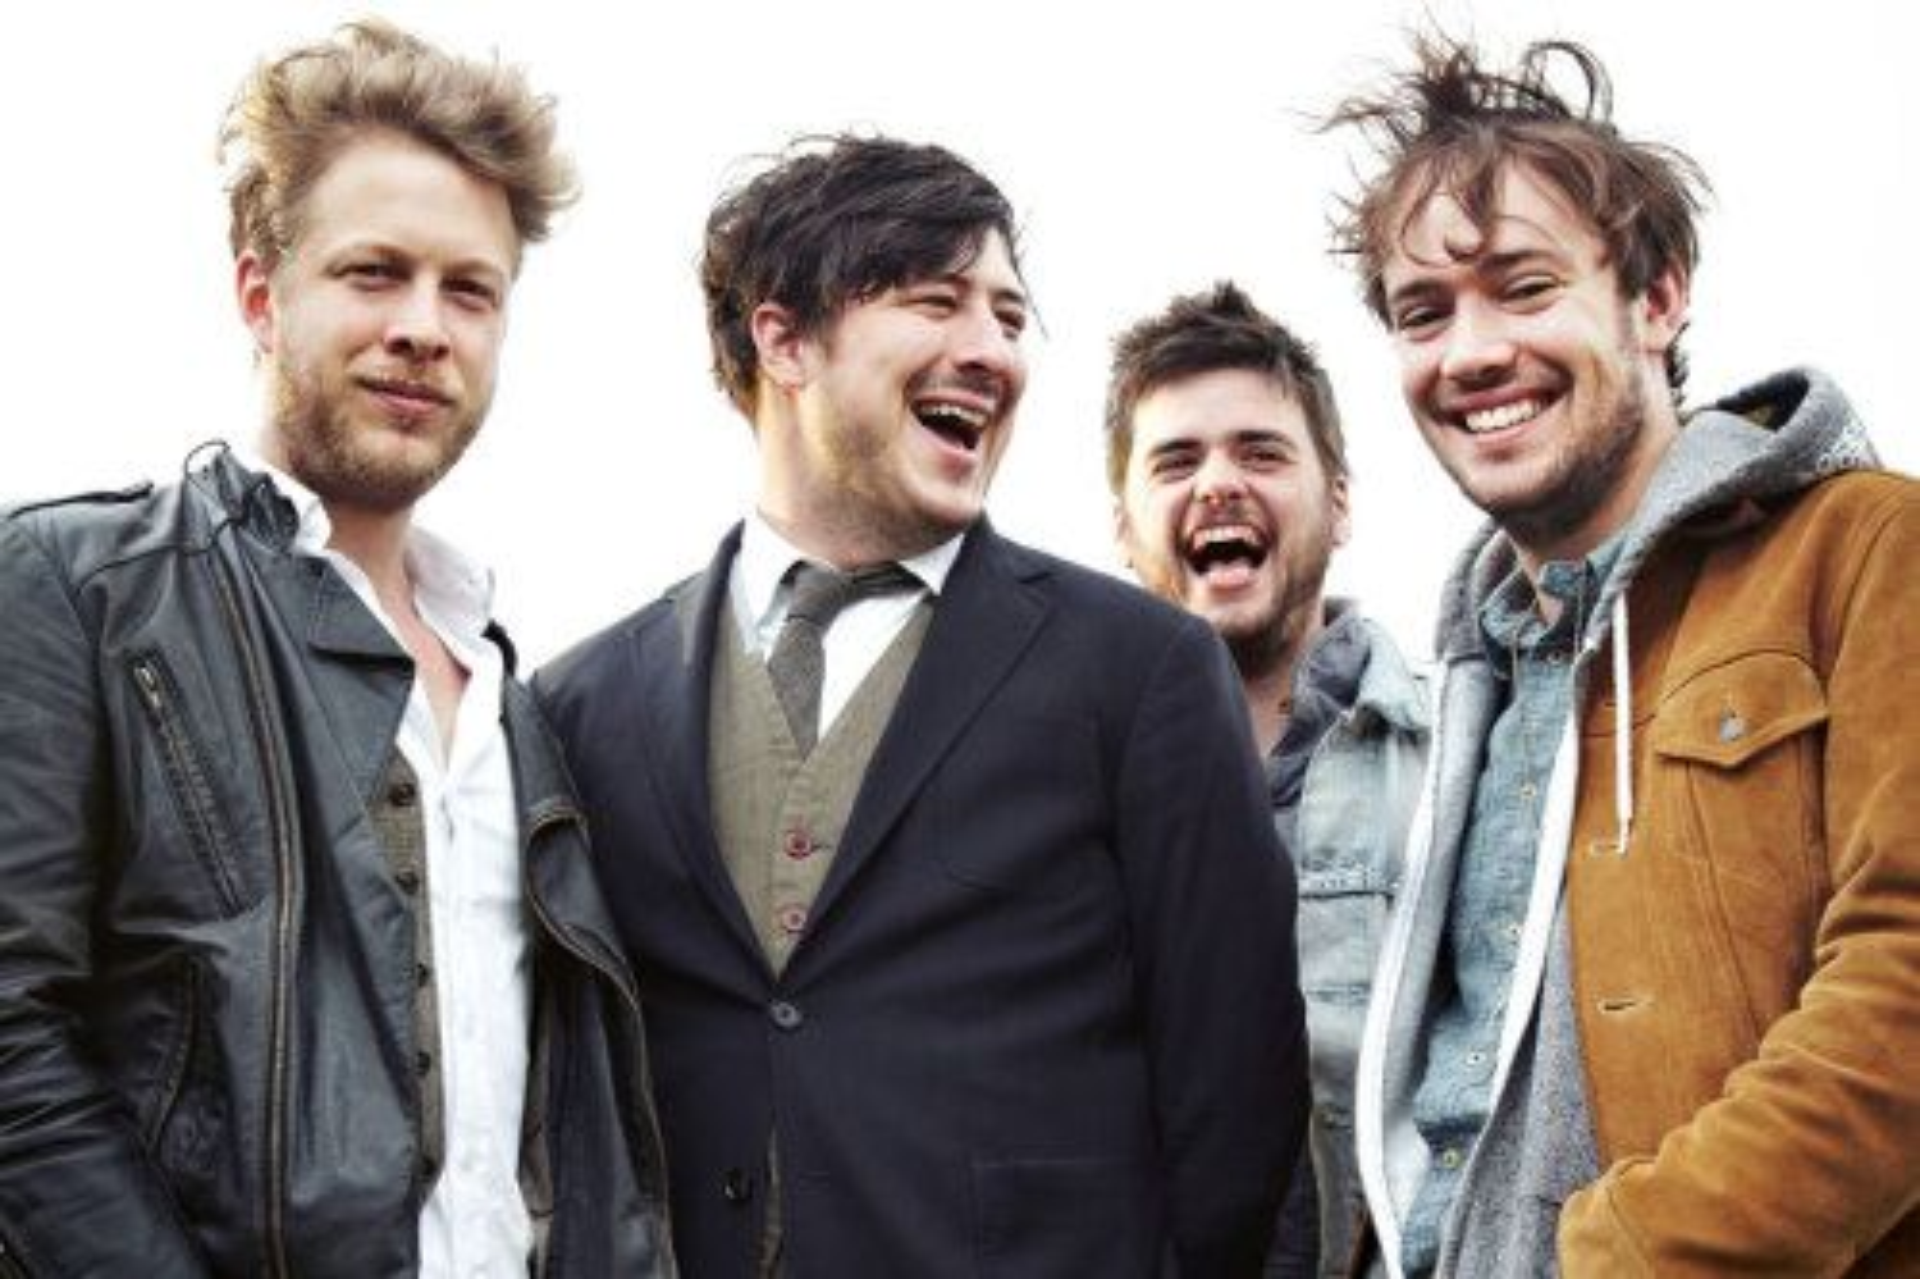 ZEROES ALBUM SPECIAL: MUMFORD & SONS - SIGH NO MORE